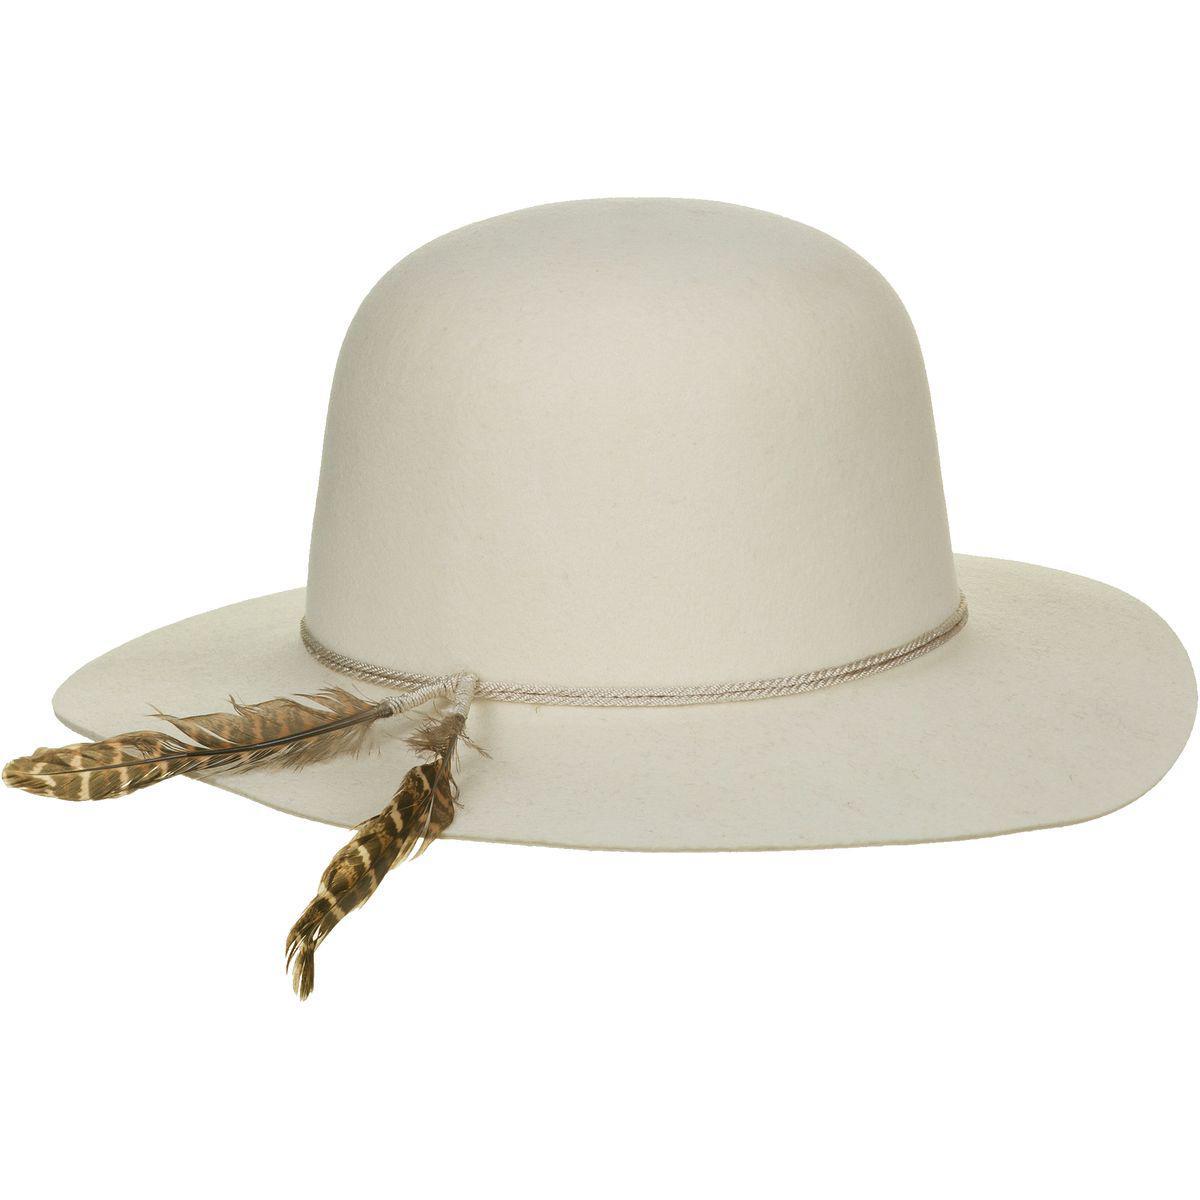 Lyst - Brixton Sol Hat in White 373f8b413a7